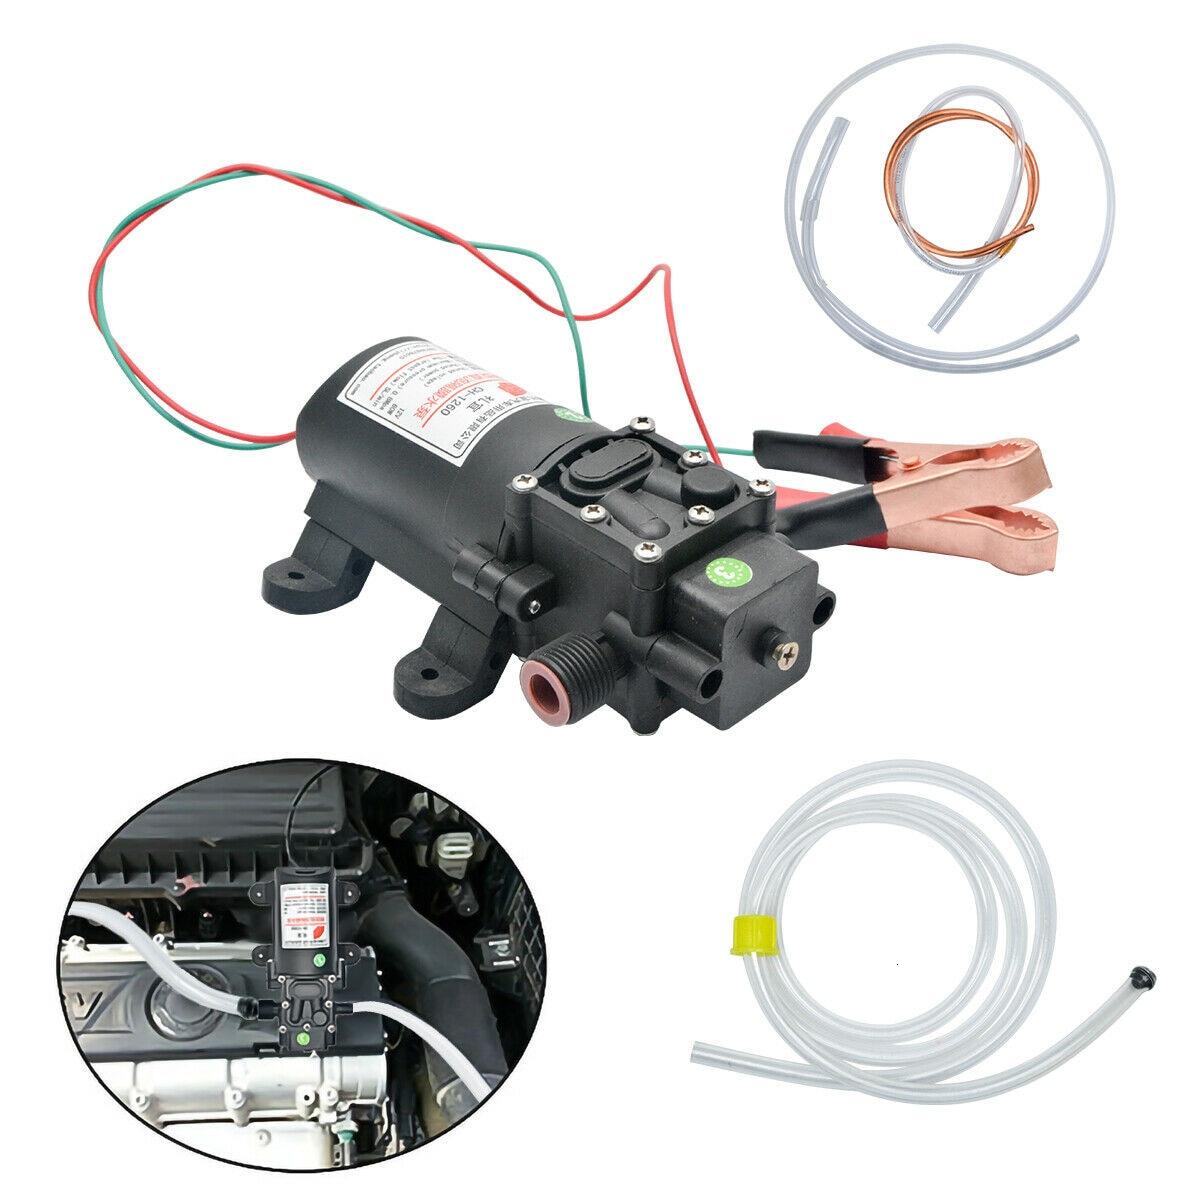 12v Olie Vloeistof Extractor 4.0L Boot Auto Auto Pomp Olie Veranderen Pomp Kit 60W